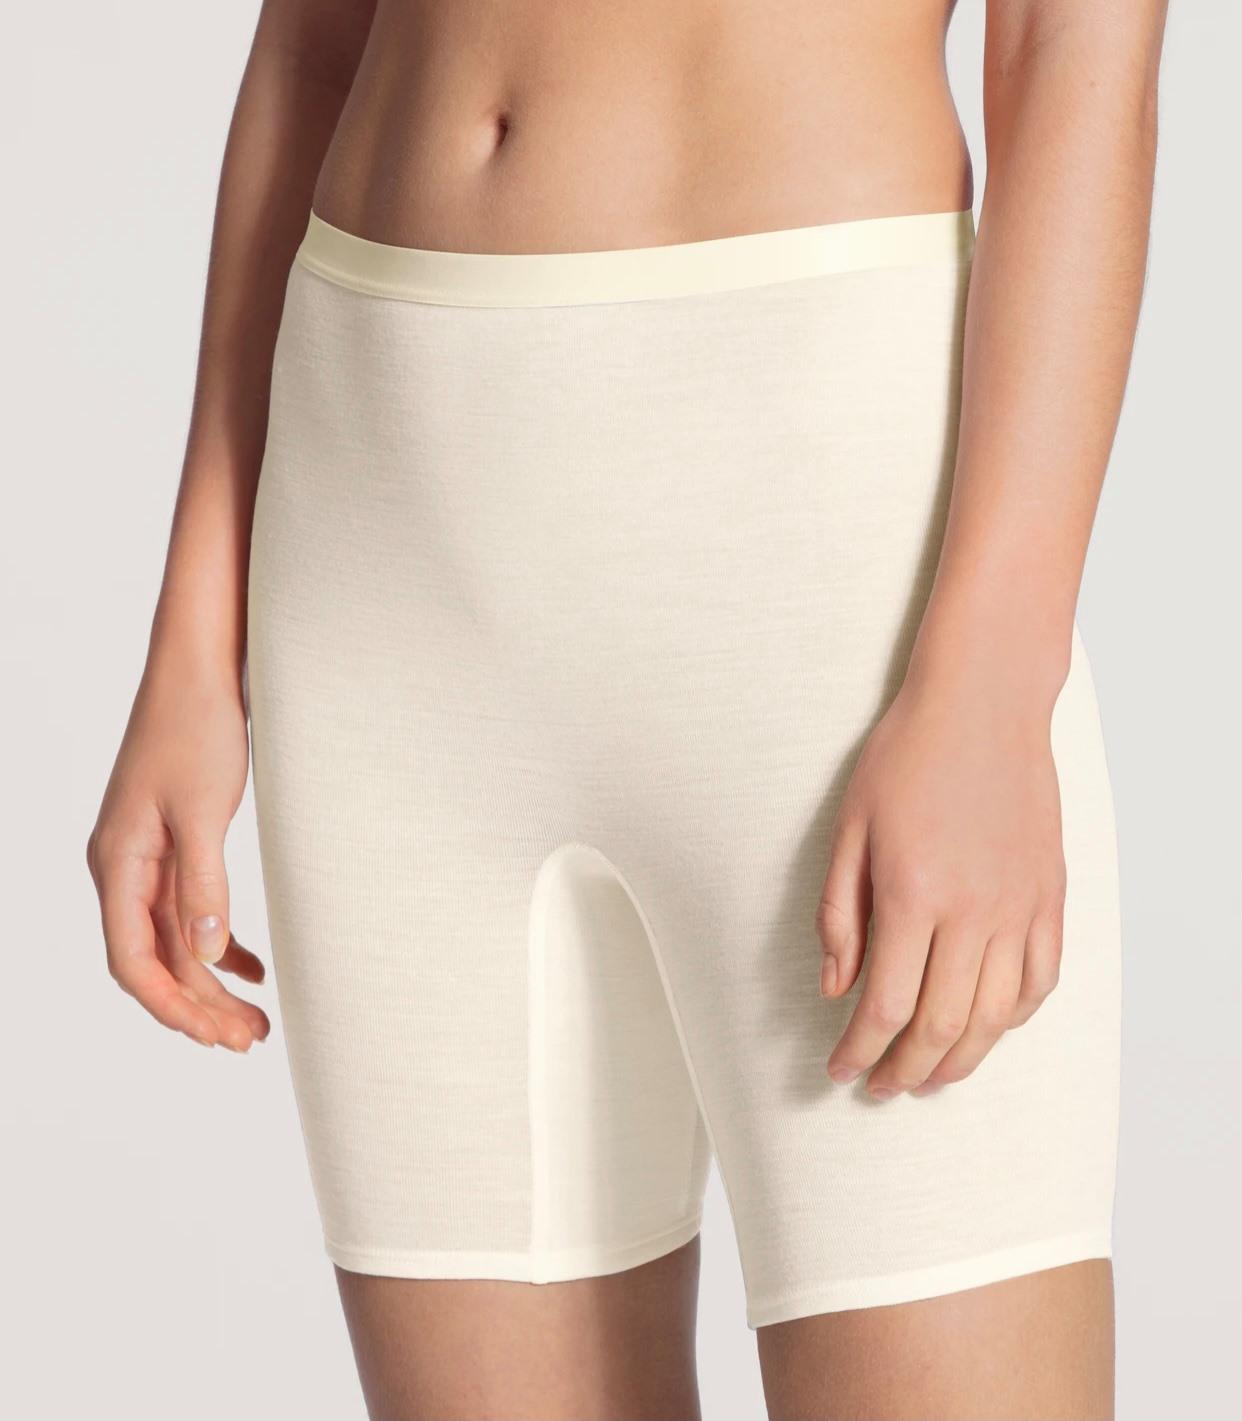 Pants medium leg l True Confidence